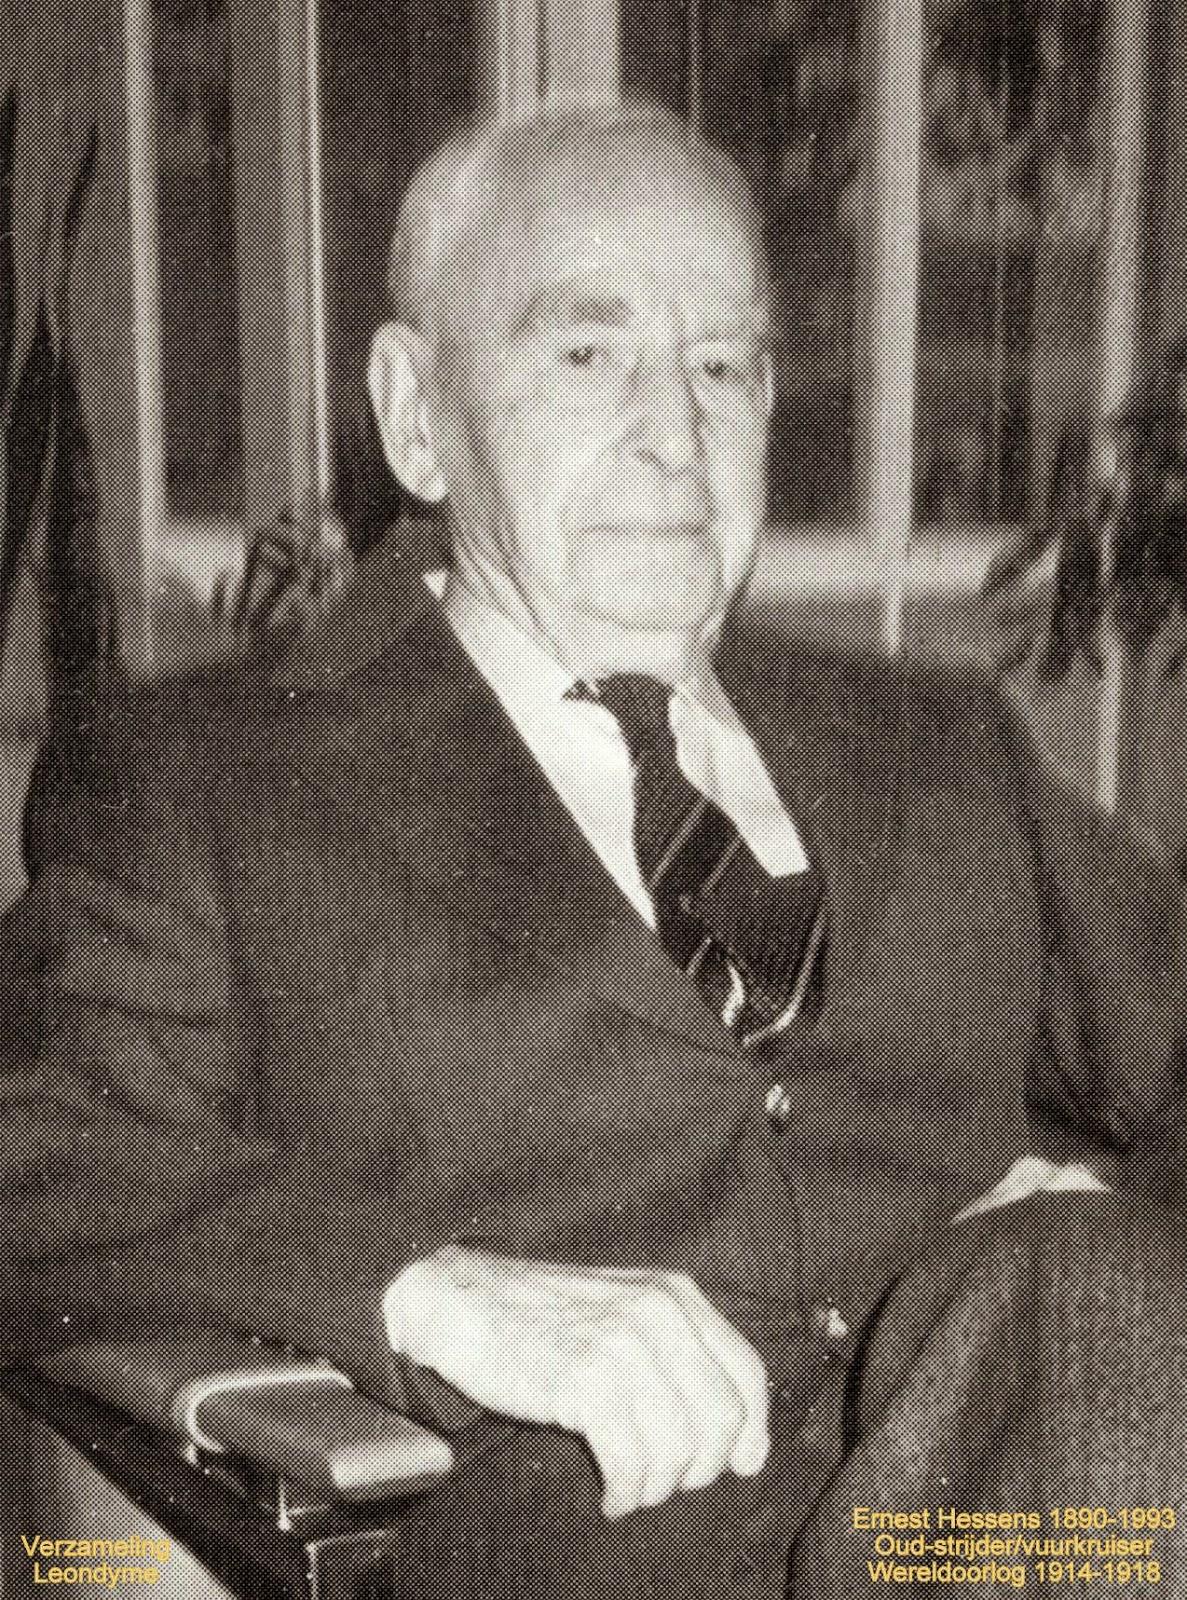 Oud-strijder en vuurkruiser Ernest Hessens uit Wereldoorlog I. Verzameling Leondyme.